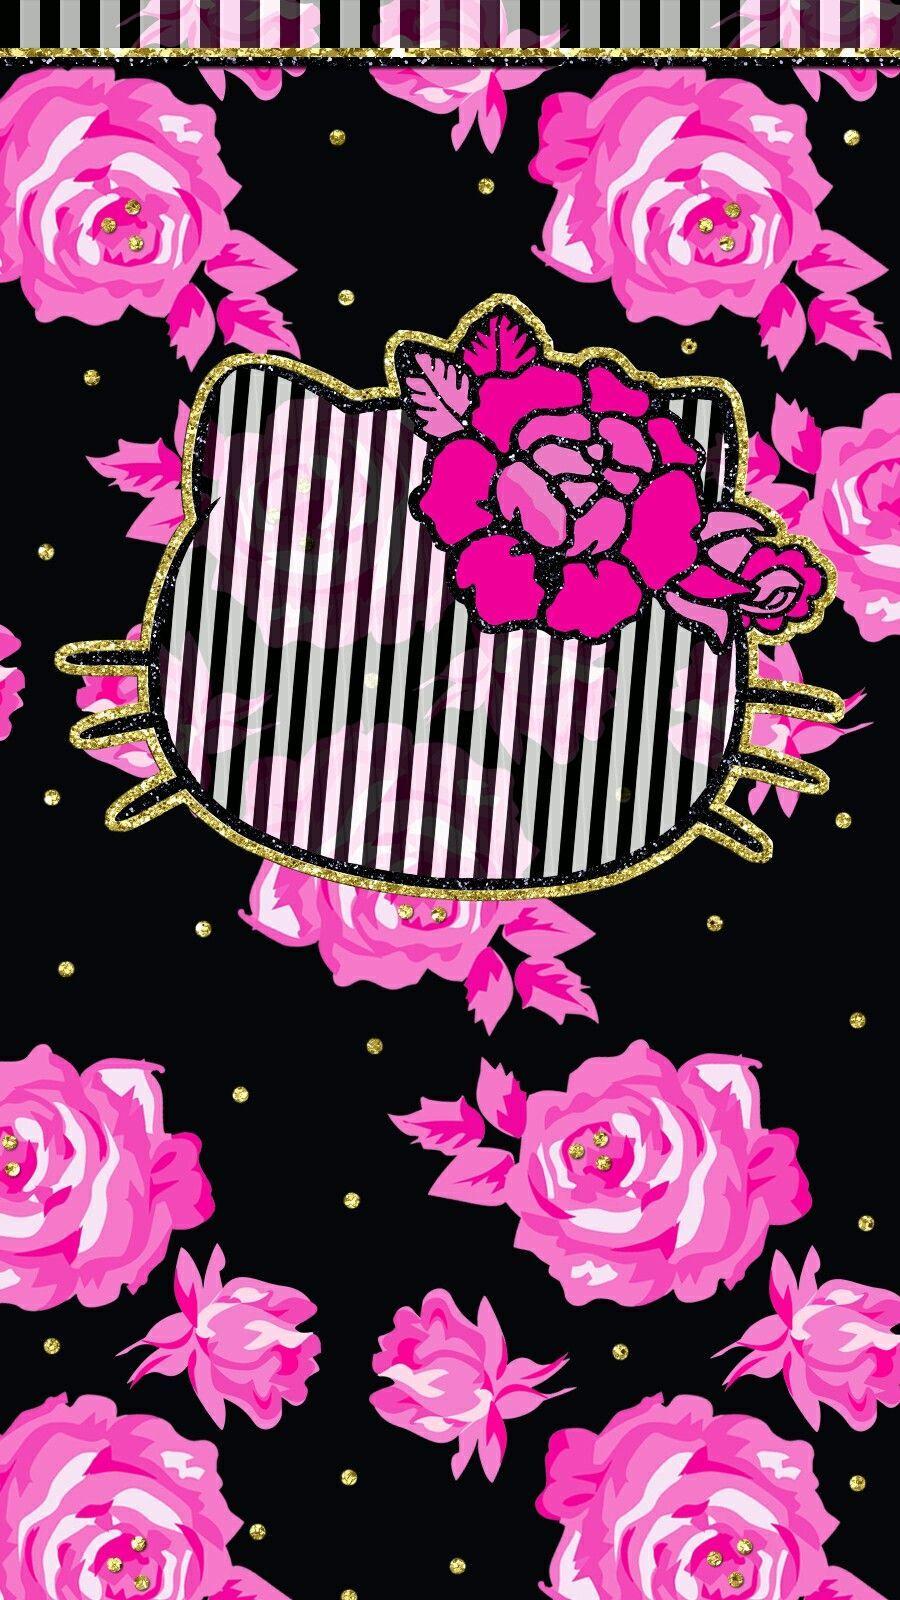 Hot Pink Black Wallpaper Iphone Cutewalls Hello Hello